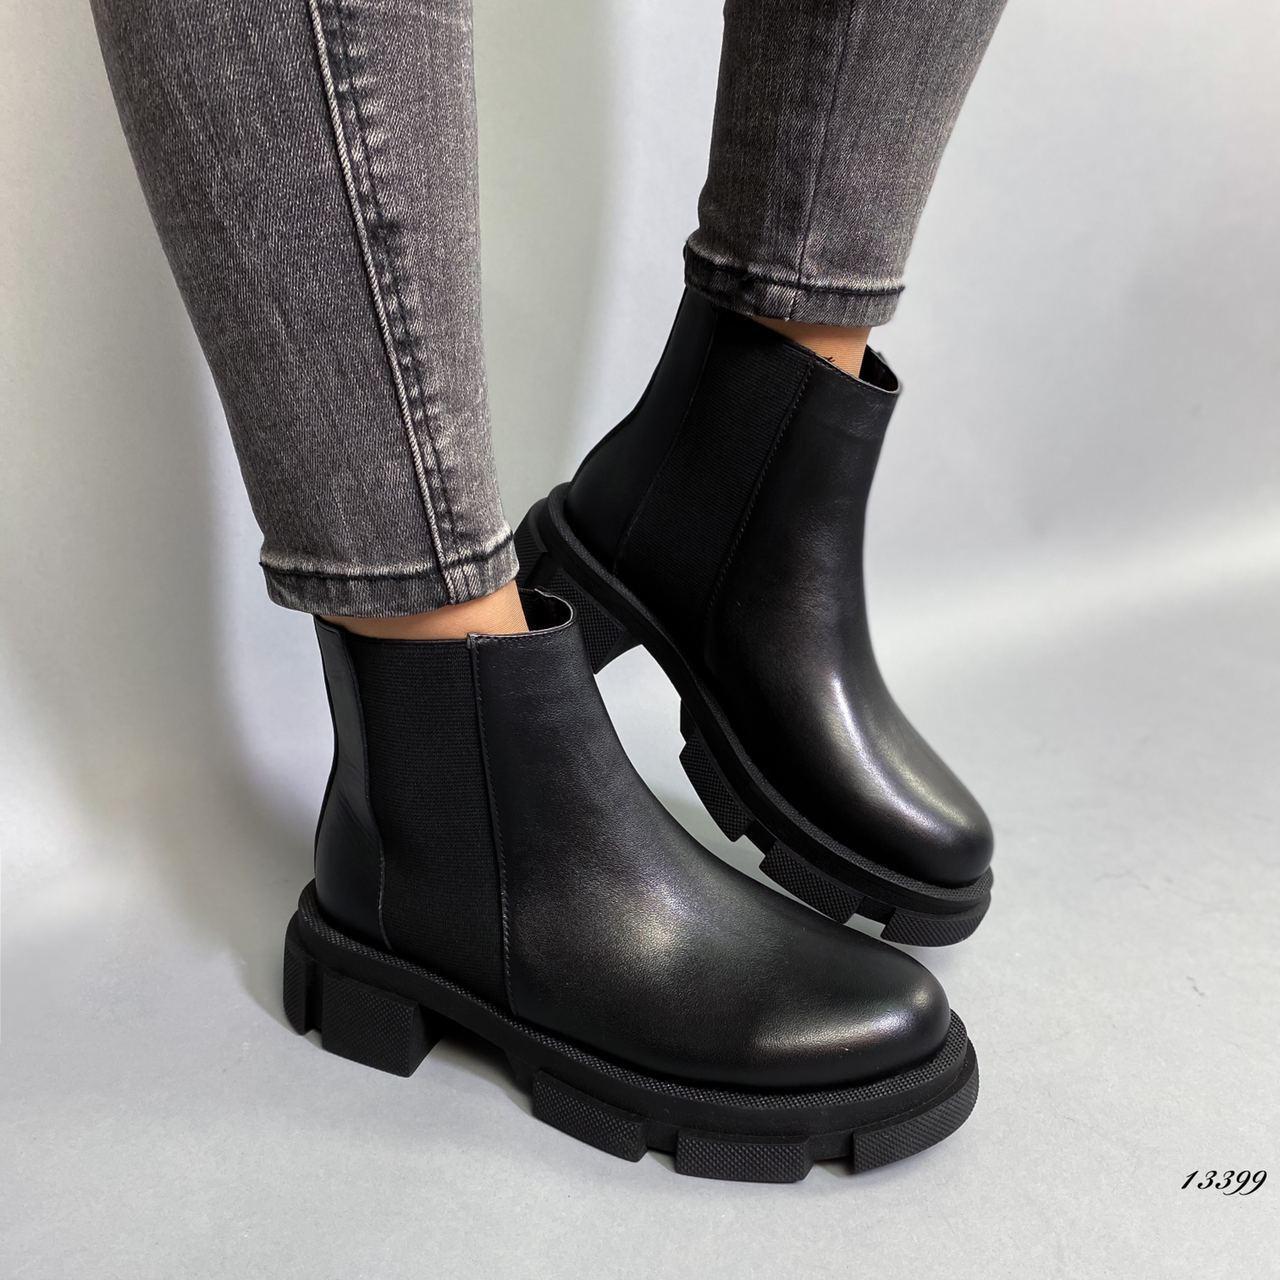 Женские ботинки Челси кожаные